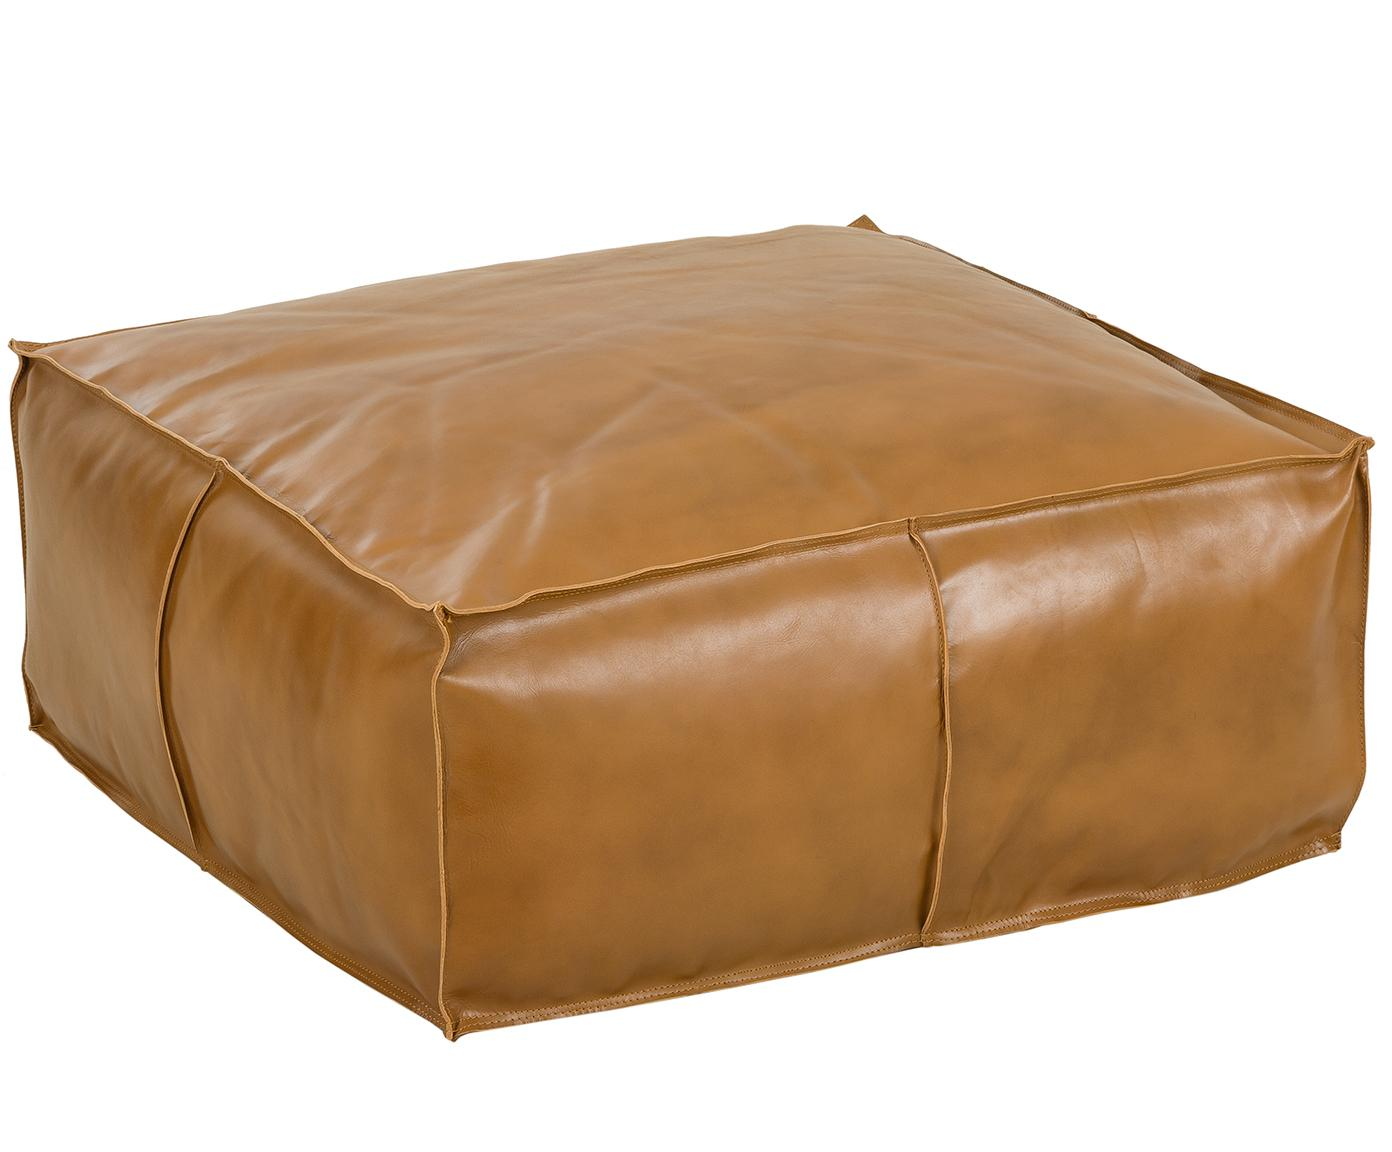 Grosser Leder-Pouf Arabica, Bezug: Leder Unterseite, Cognac, 70 x 30 cm